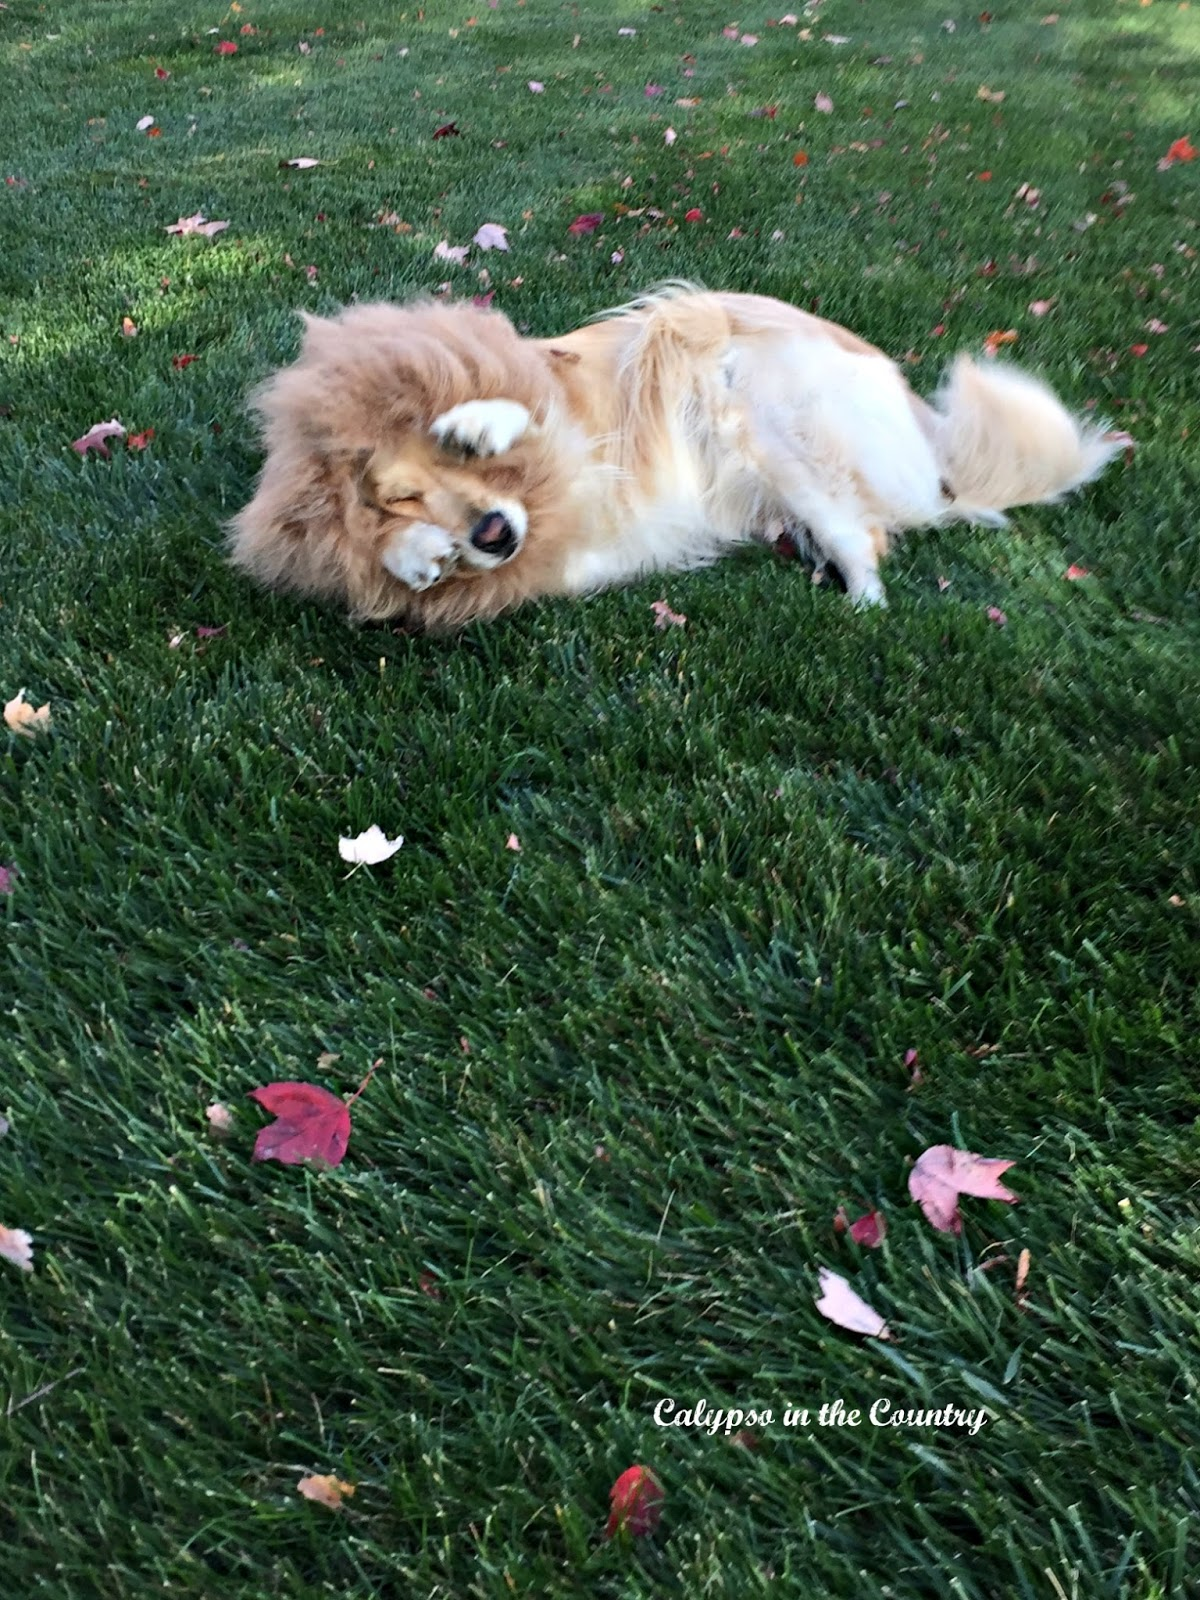 Golden Retriever dressed as a lion for Halloween